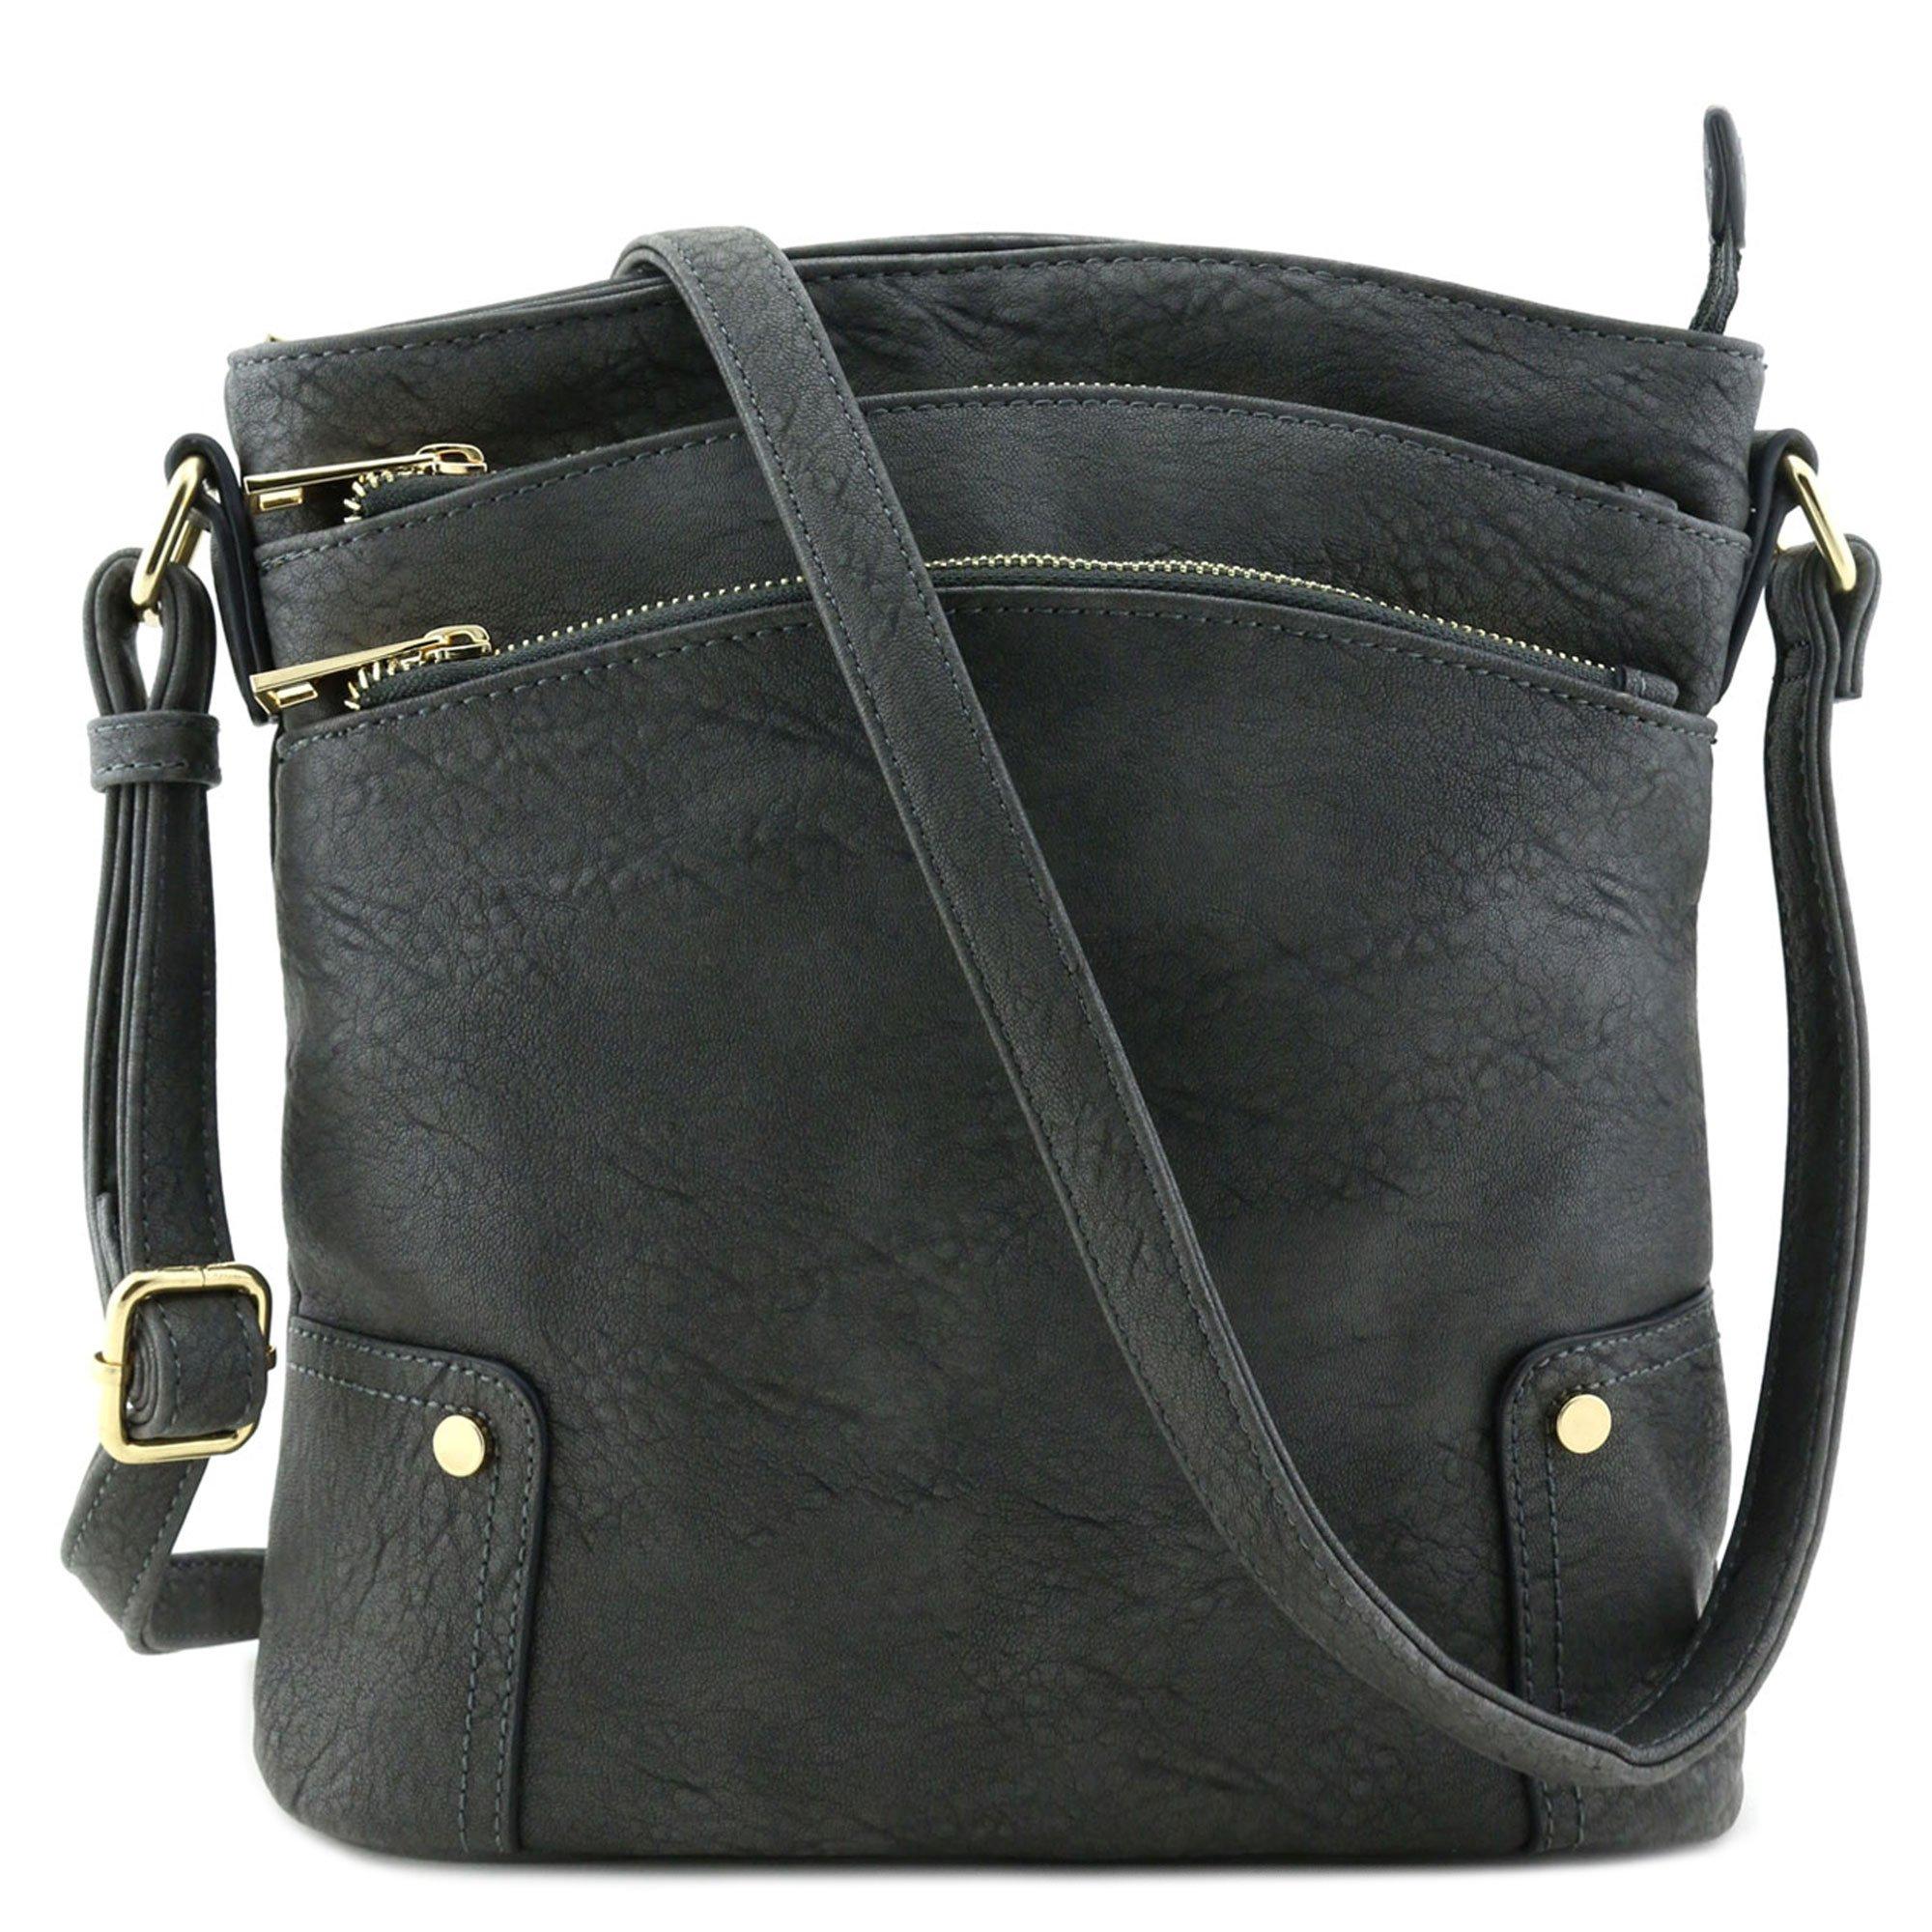 Triple Zip Pocket Large Crossbody Bag Dark Gray